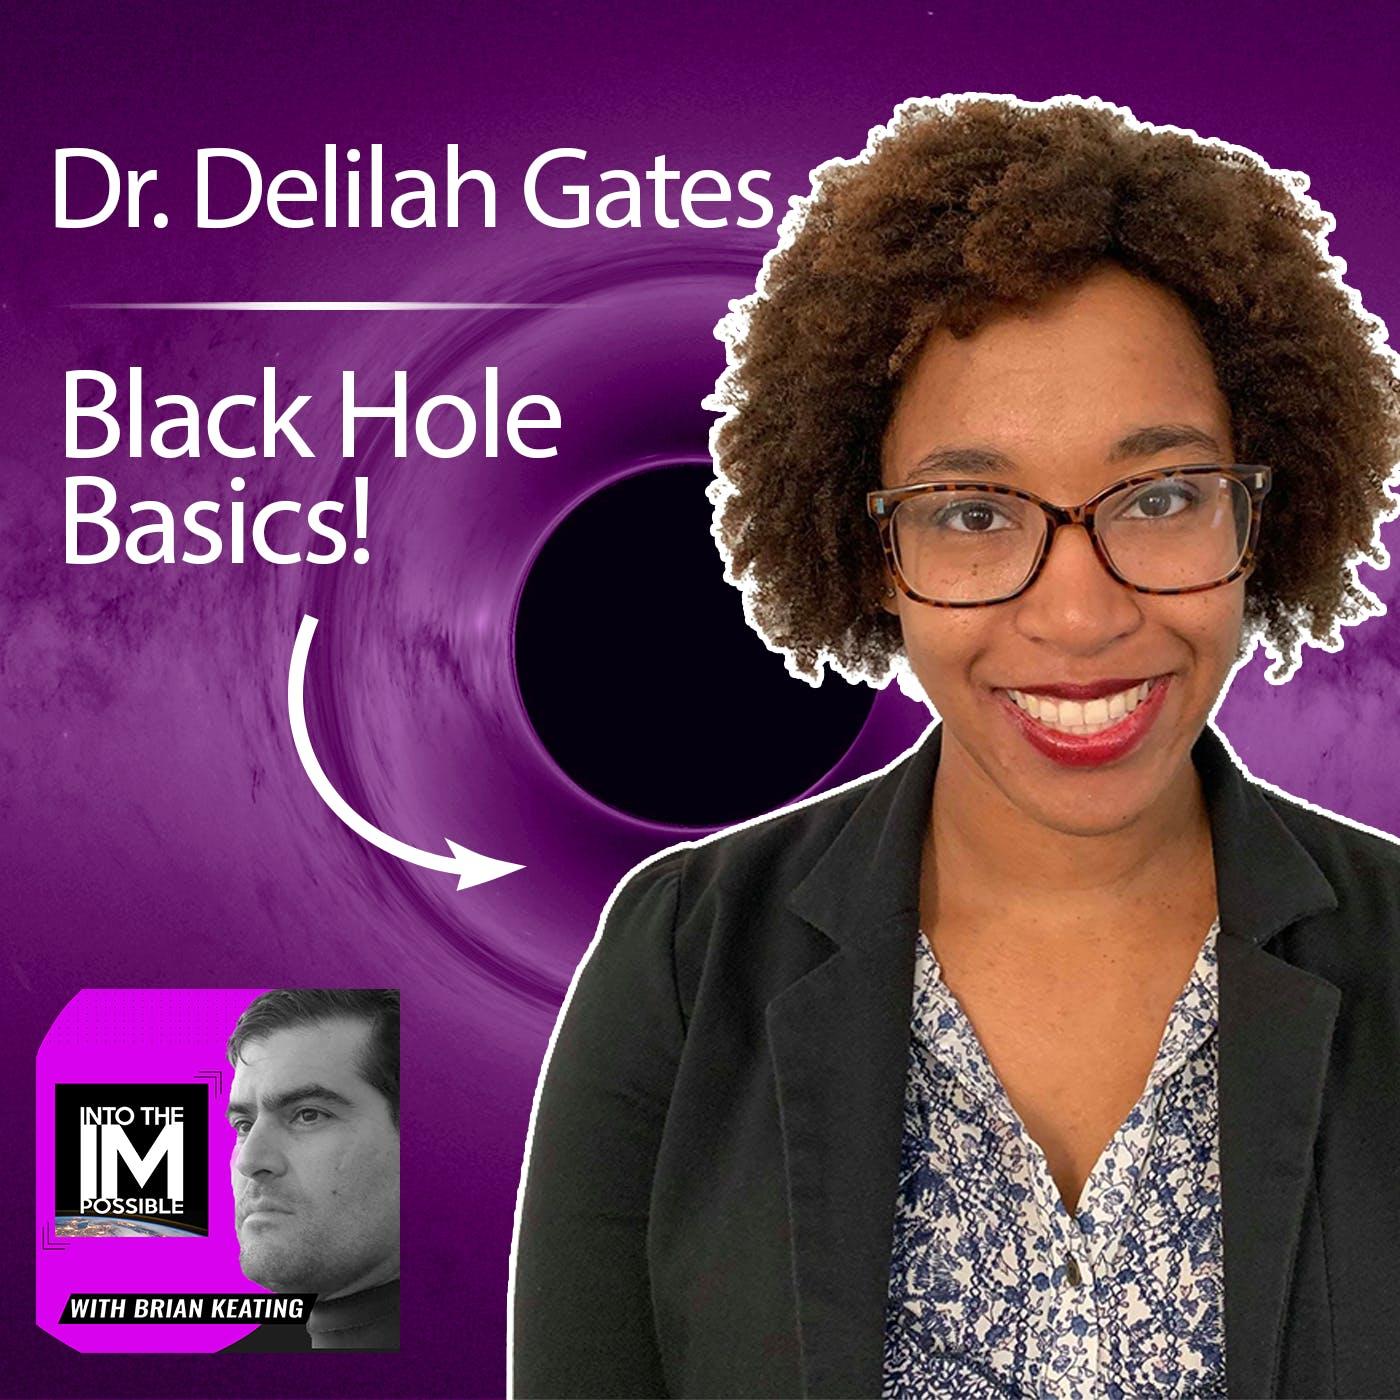 Delilah Gates: Black Hole Basics!